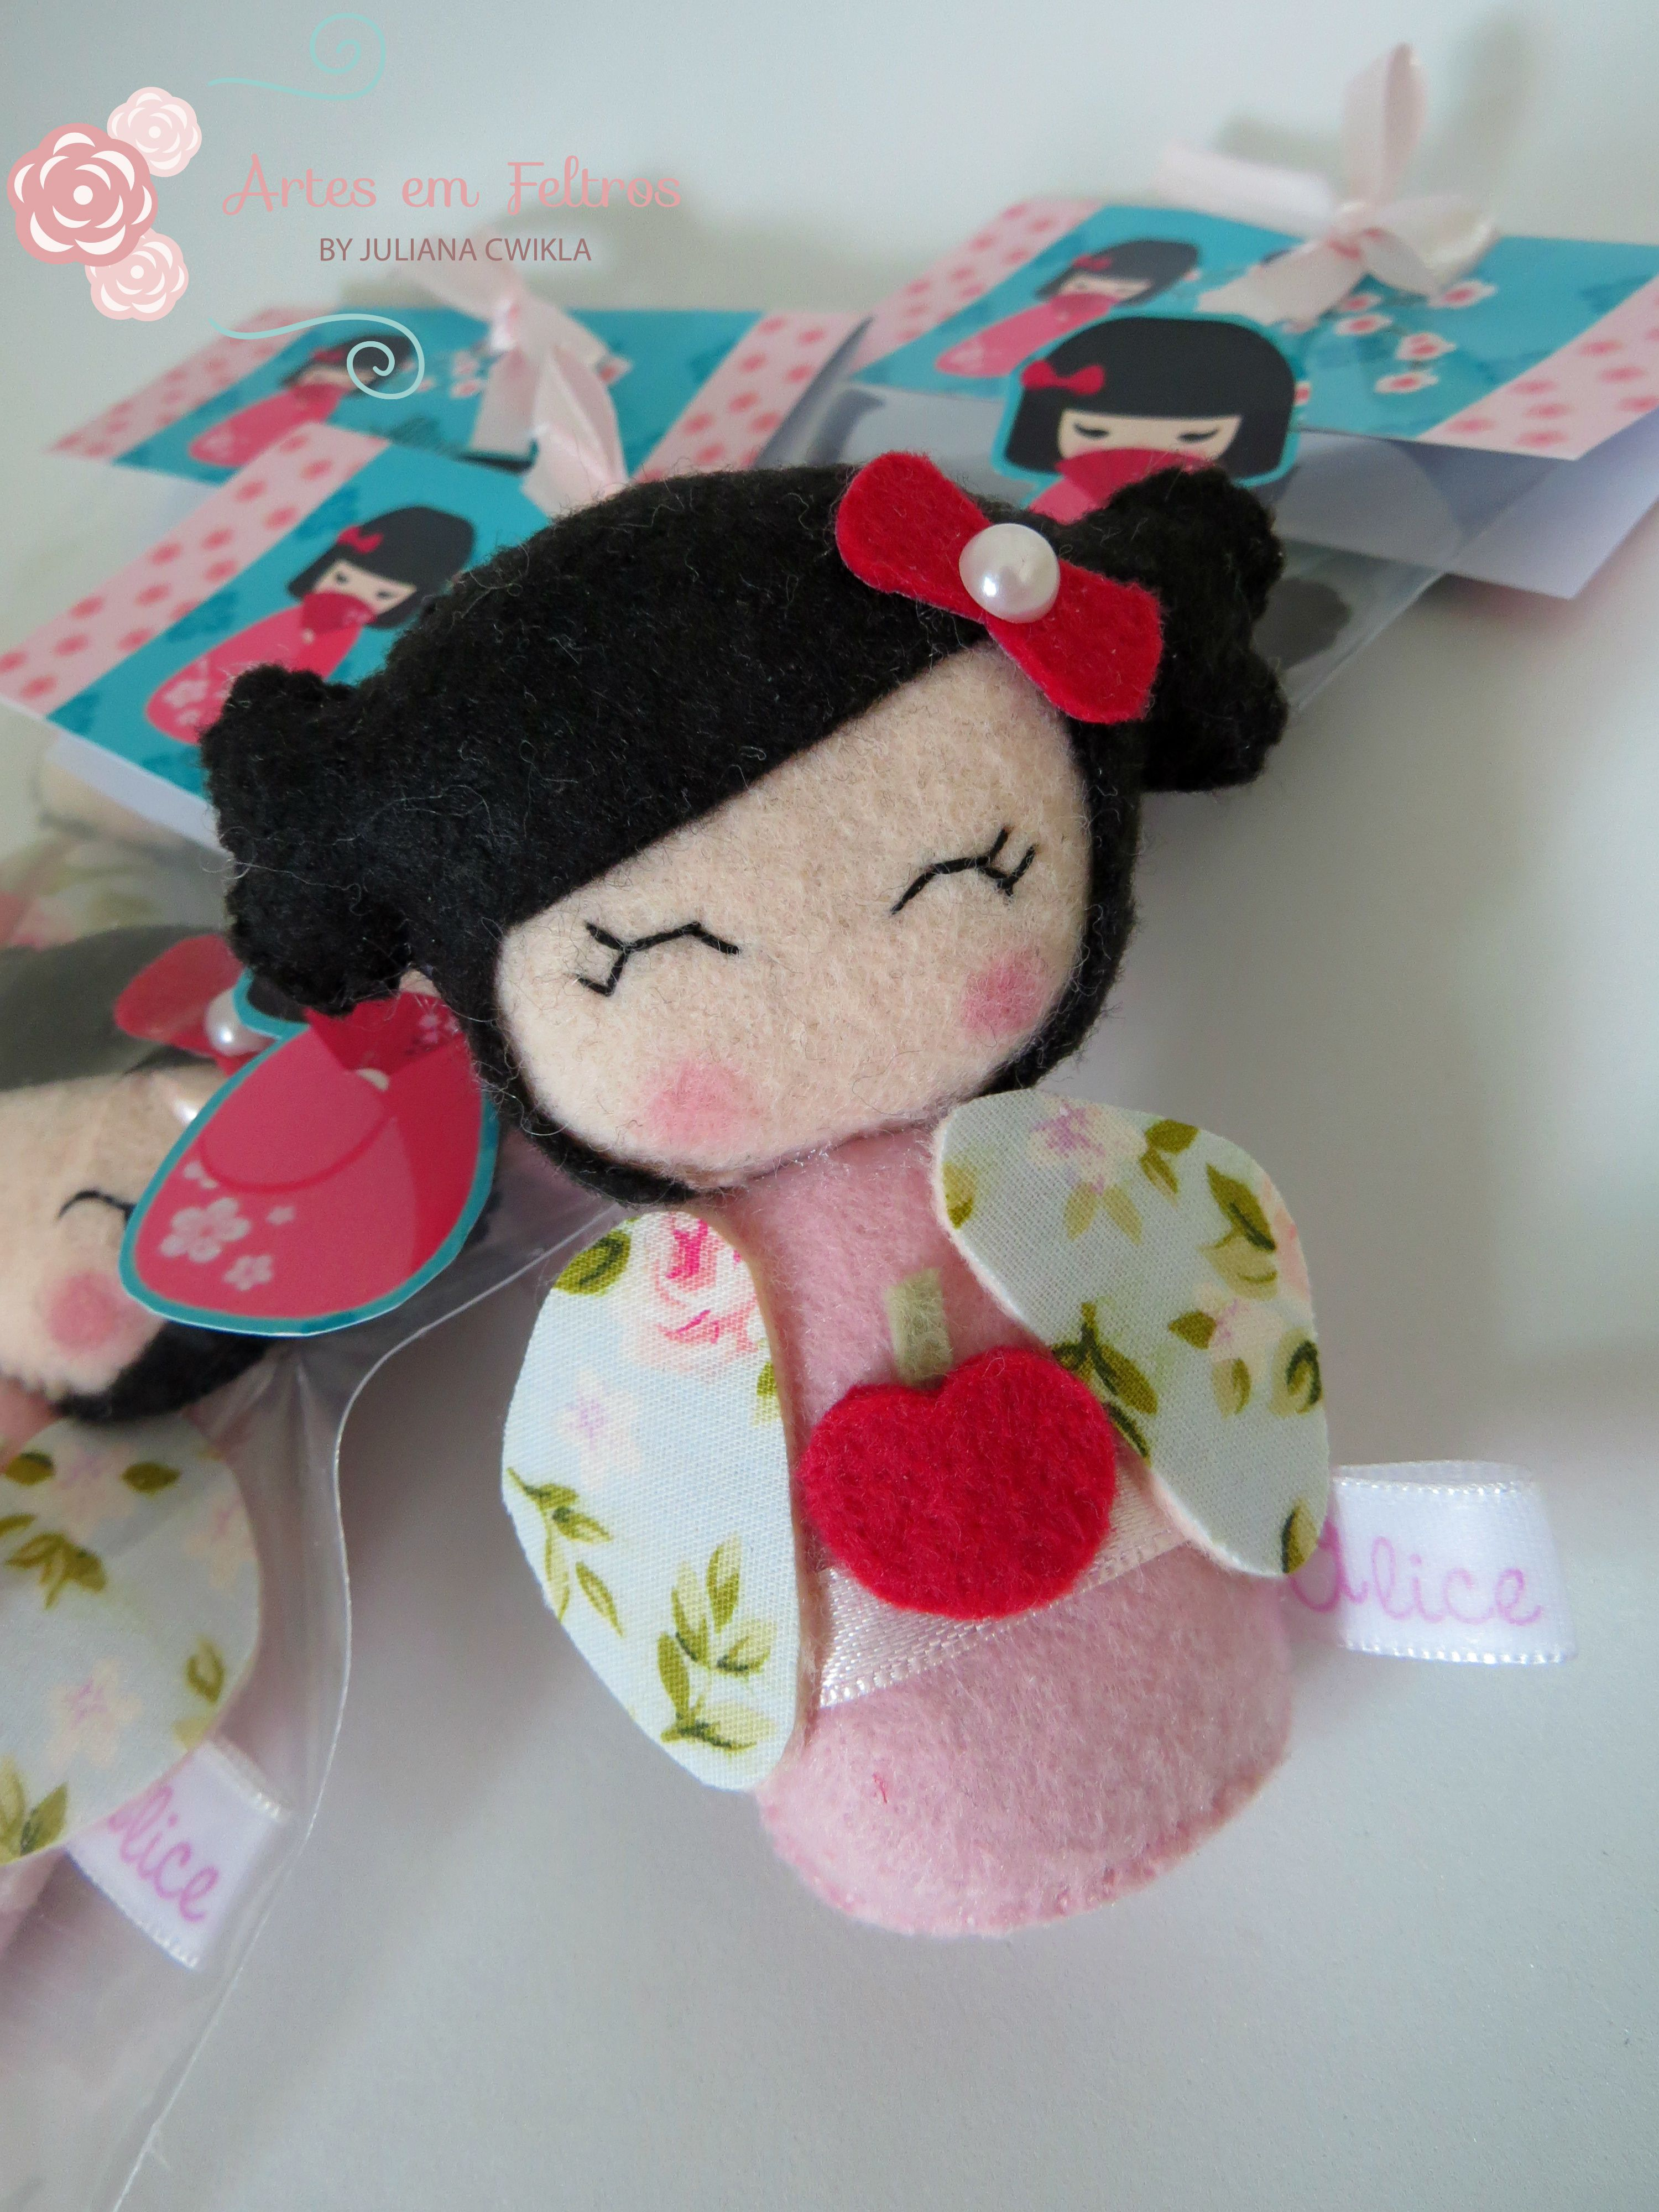 Adesivo De Parede Infantil Nuvem ~ Lembrancinha Boneca Kokeshi kokeshi Pinterest